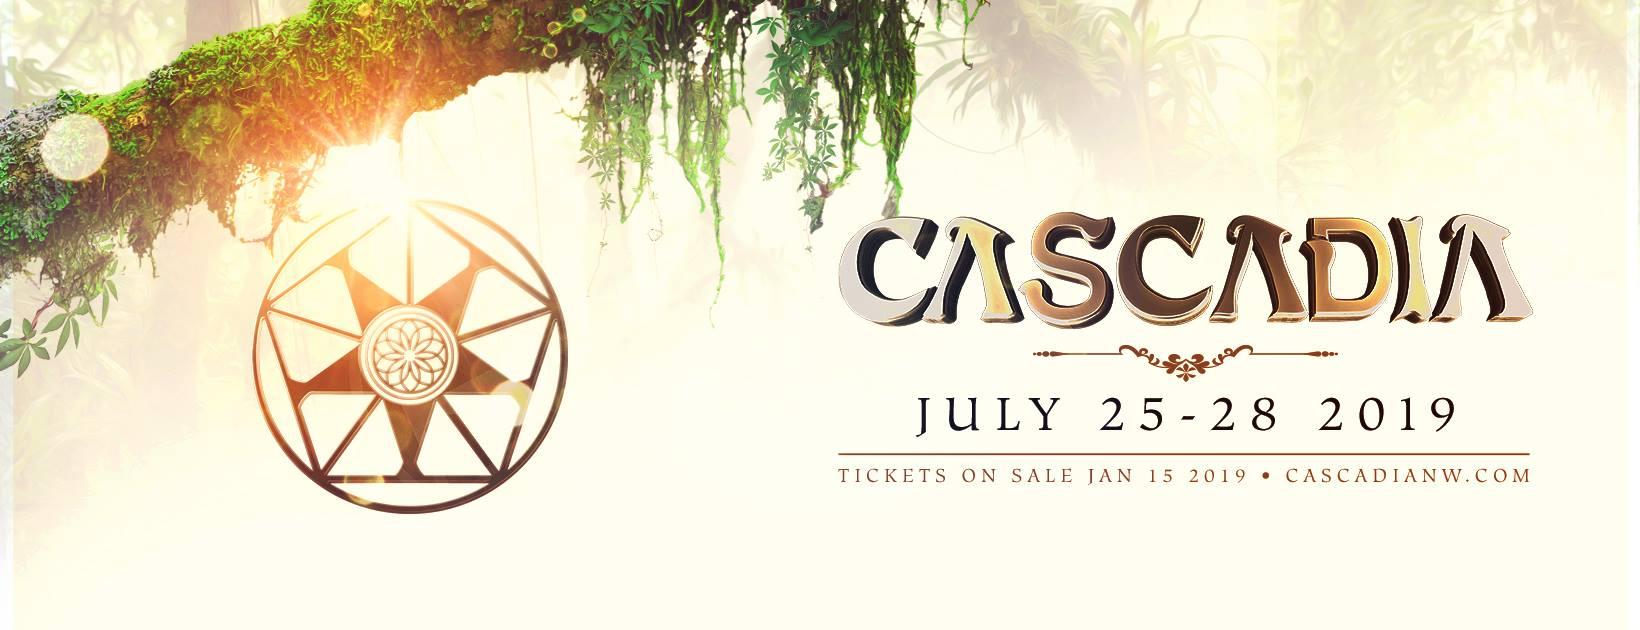 2019 Cascadia NW Festival.jpg